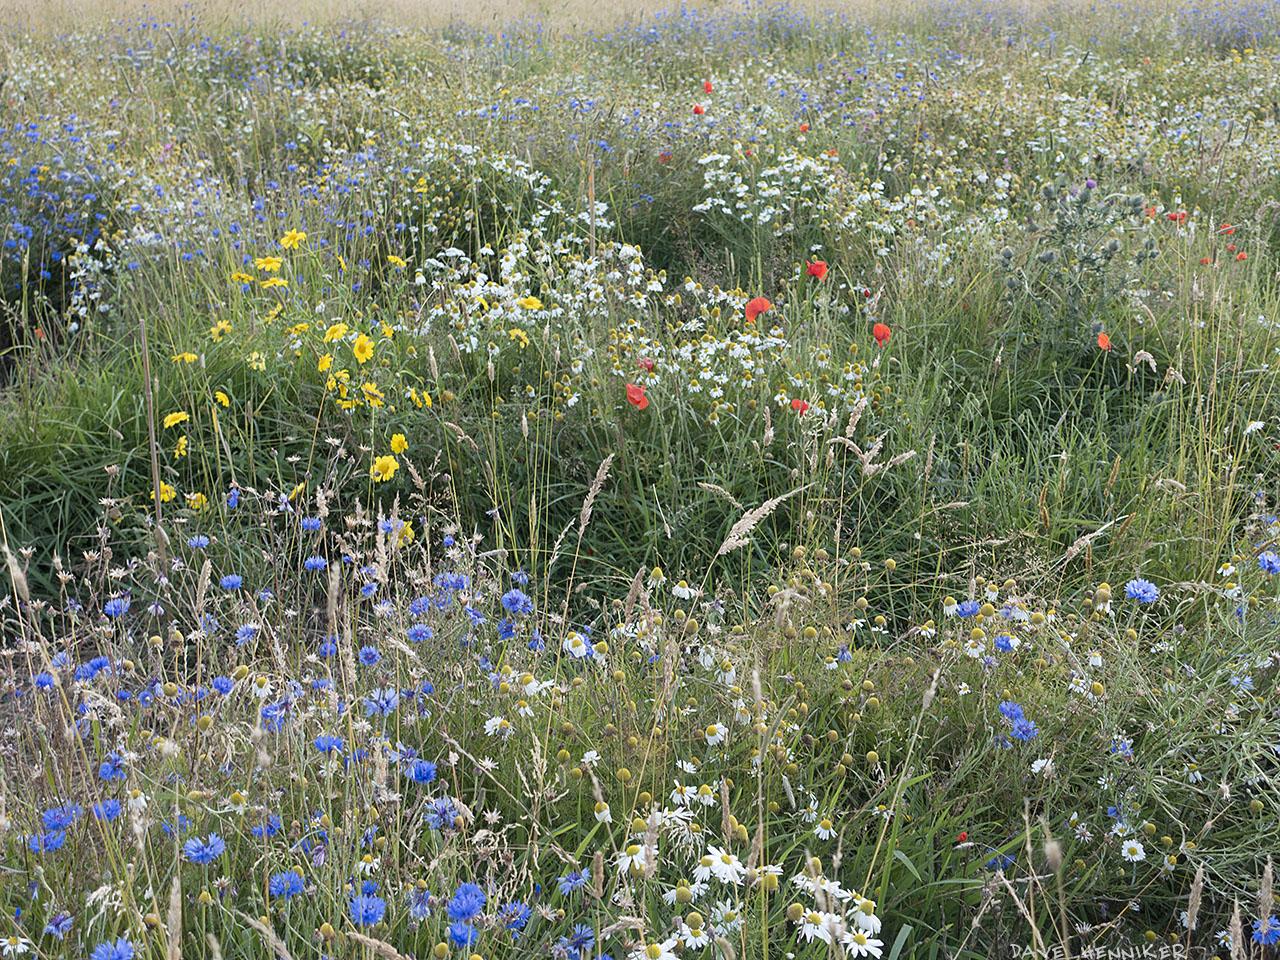 Dreghorn-Bonaly_FlowerMeadow